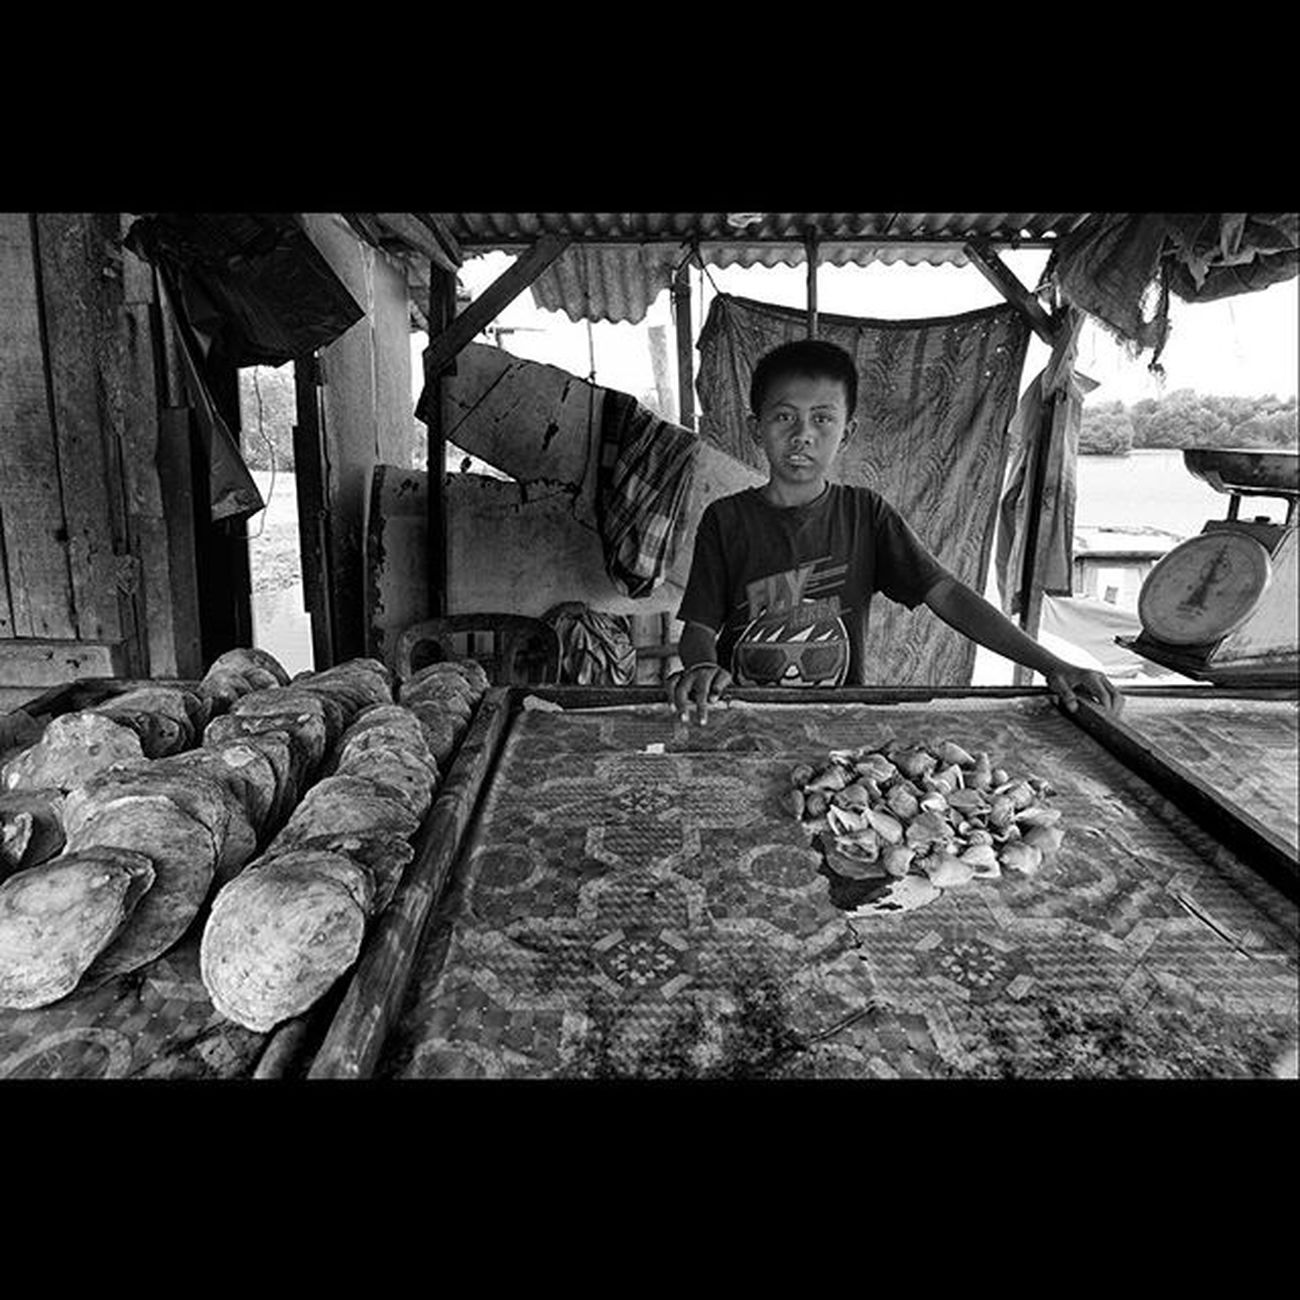 "This boy was a saler of big snail it's called ""Gonggong"" and big shell called ""Lokan"". the gonggong was only lived at Kepulauan Riau waters. Anak lelaki ini ialah seorang penjual siput besar yang biasa disebut ""Gonggong"" dan kerang besar disebut ""Lokan"". Gonggong hanya hidup di perairan Kepulauan Riau. Dailylife Wonderfulkepri  Explorekepri KepriBukanRiau Indonesia_photography Geonusantara Kompasnusantara Pewartafotoindonesia Natgeonesia 1000kata Wonderfulindonesia Serikat_fi IndonesiaOnly Photooftheday Thephotosociety Stagephoto Hipaae Hipasnap Blackandwhitephoto Bw_indonesia Artphoto_bw Bnw_globe Bnw_worldwide Bestshooter_bw Monochrome FujiGuysID"